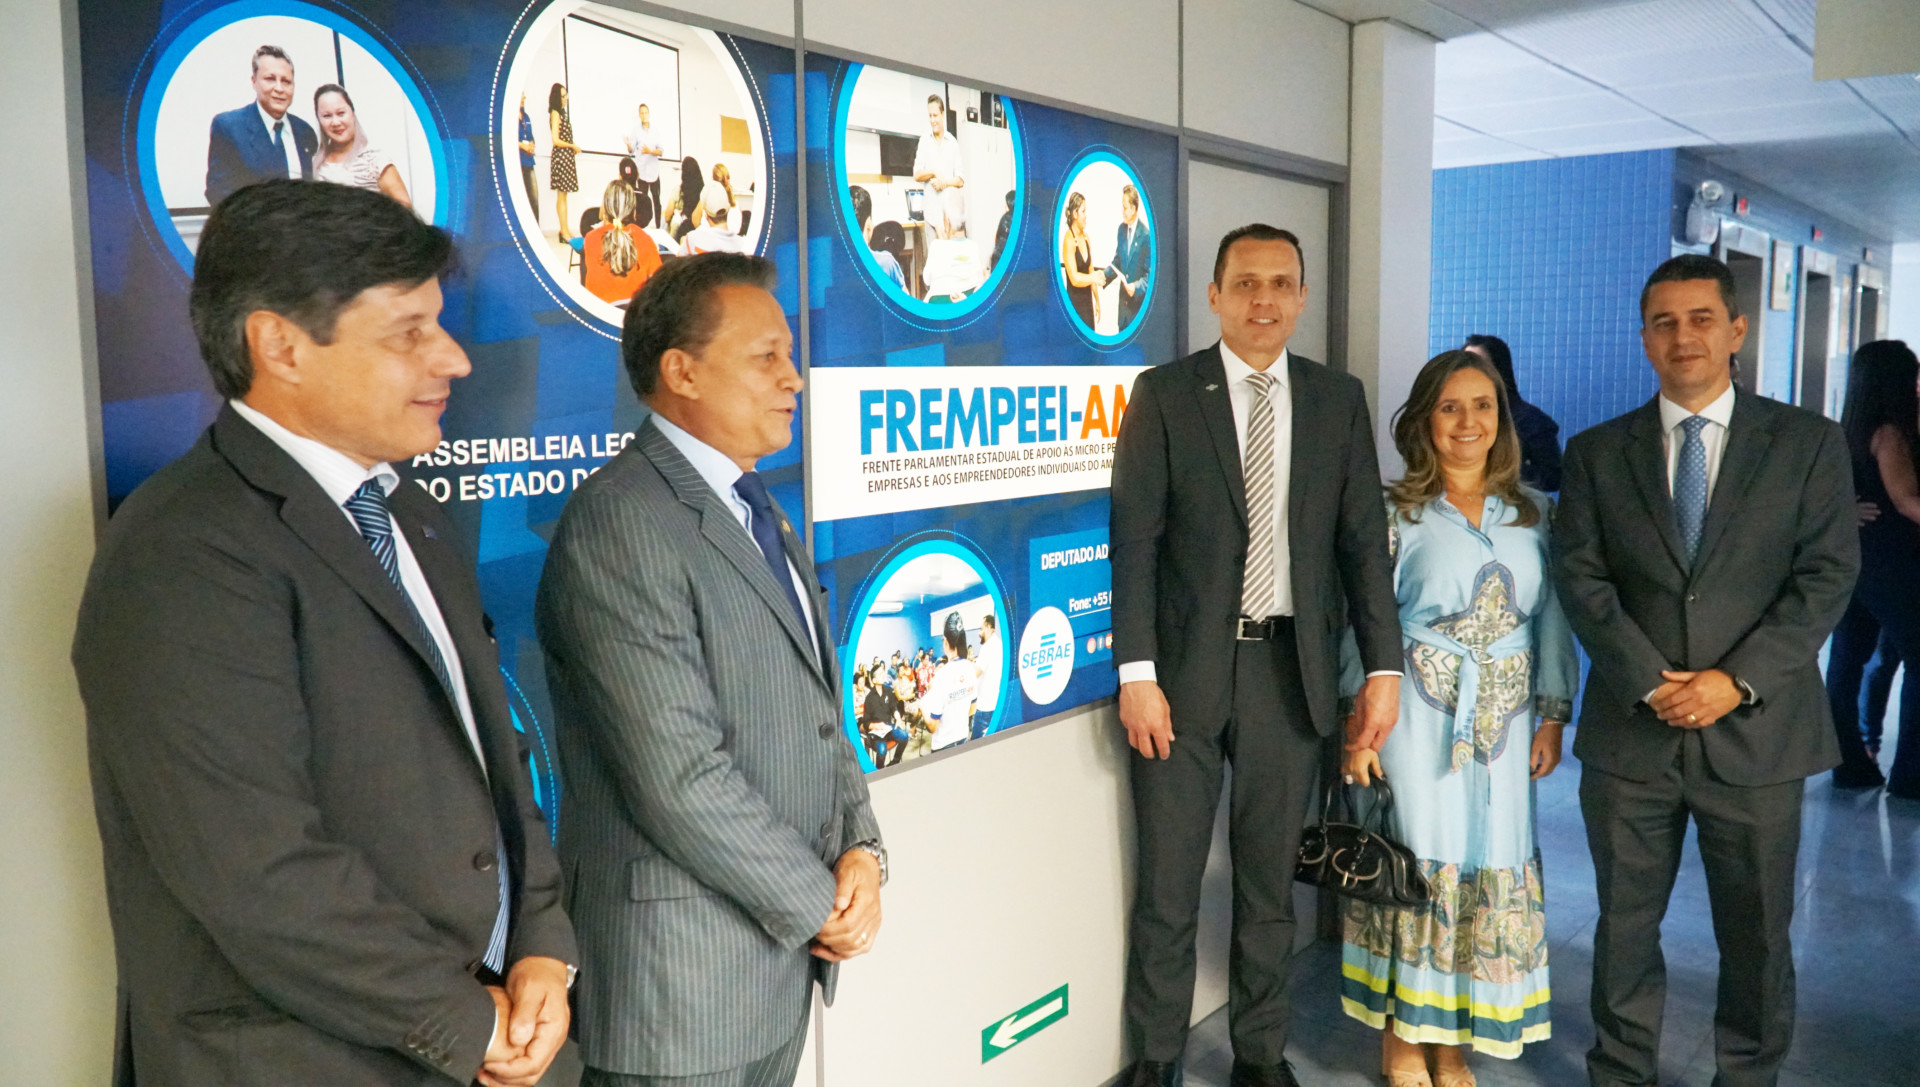 Visita à Sala do Empreendedor, localizada na Assembleia Legislativa Manaus